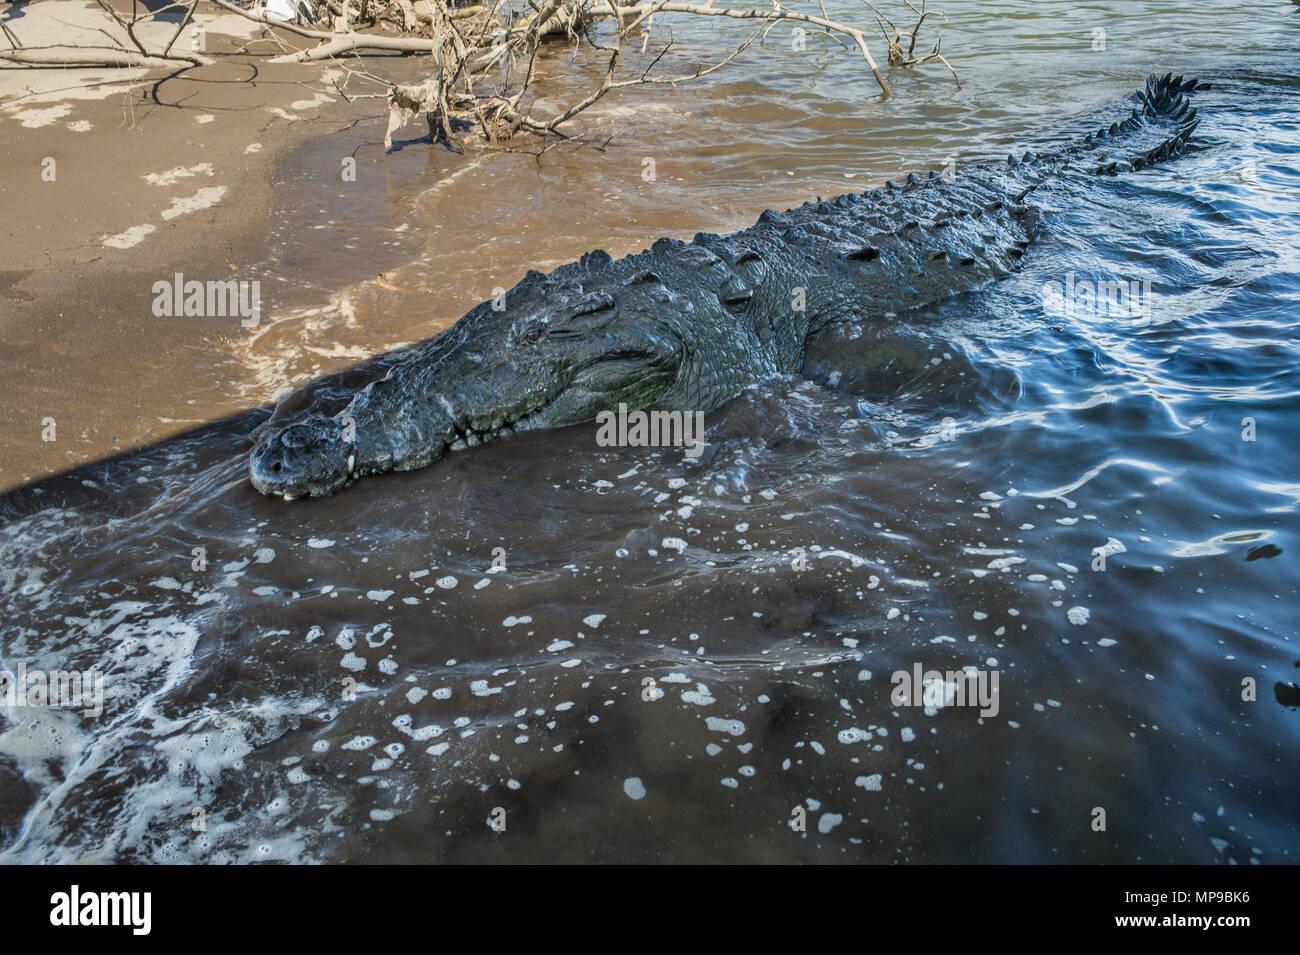 American Cocodile, Crocodylus acutus, Crocodylidae, Rio Tarcoles, Costa Rica, Centroamerica - Stock Image